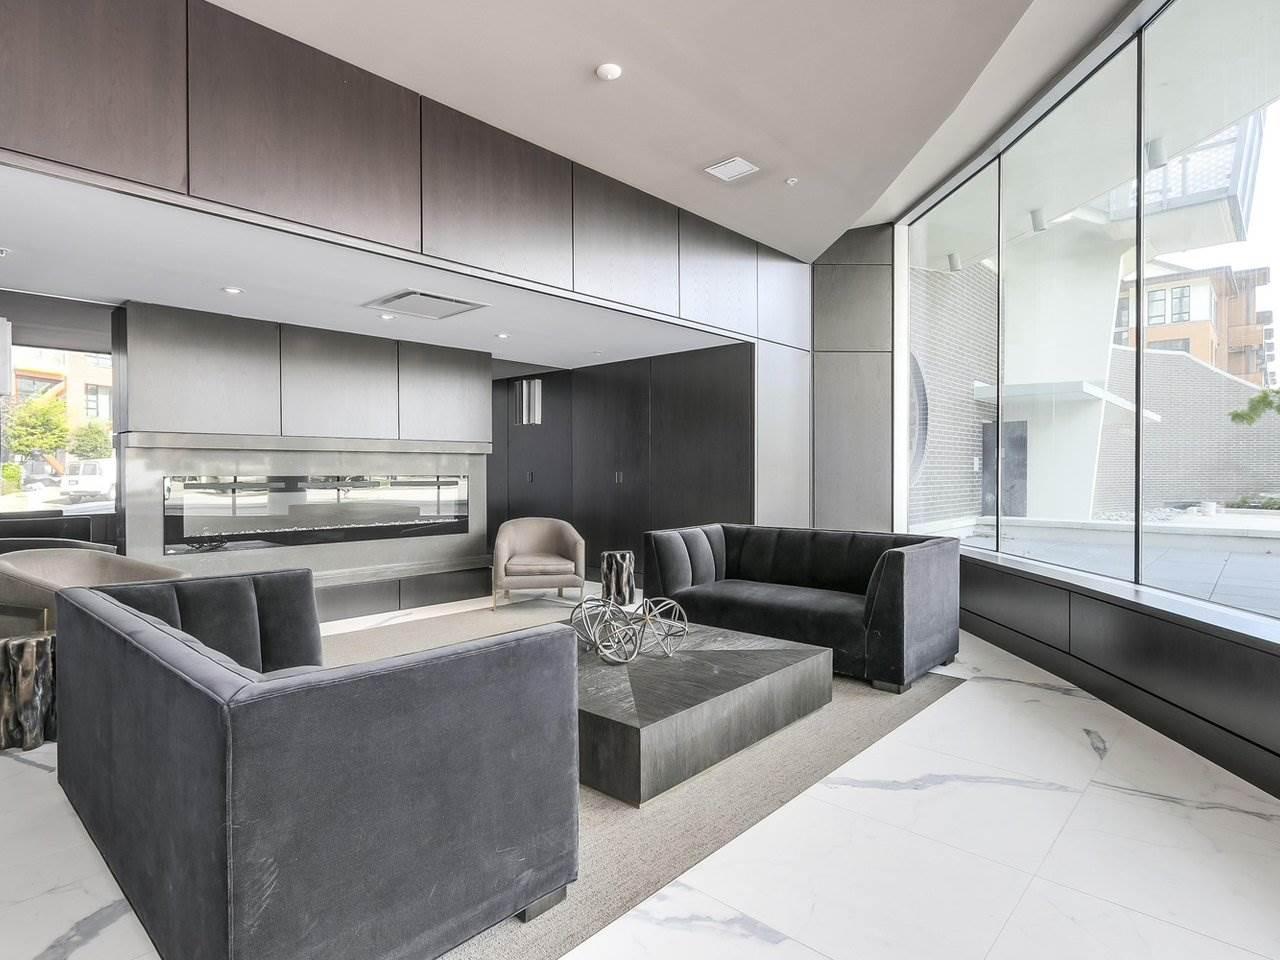 Condo Apartment at 1602 210 SALTER STREET, Unit 1602, New Westminster, British Columbia. Image 2